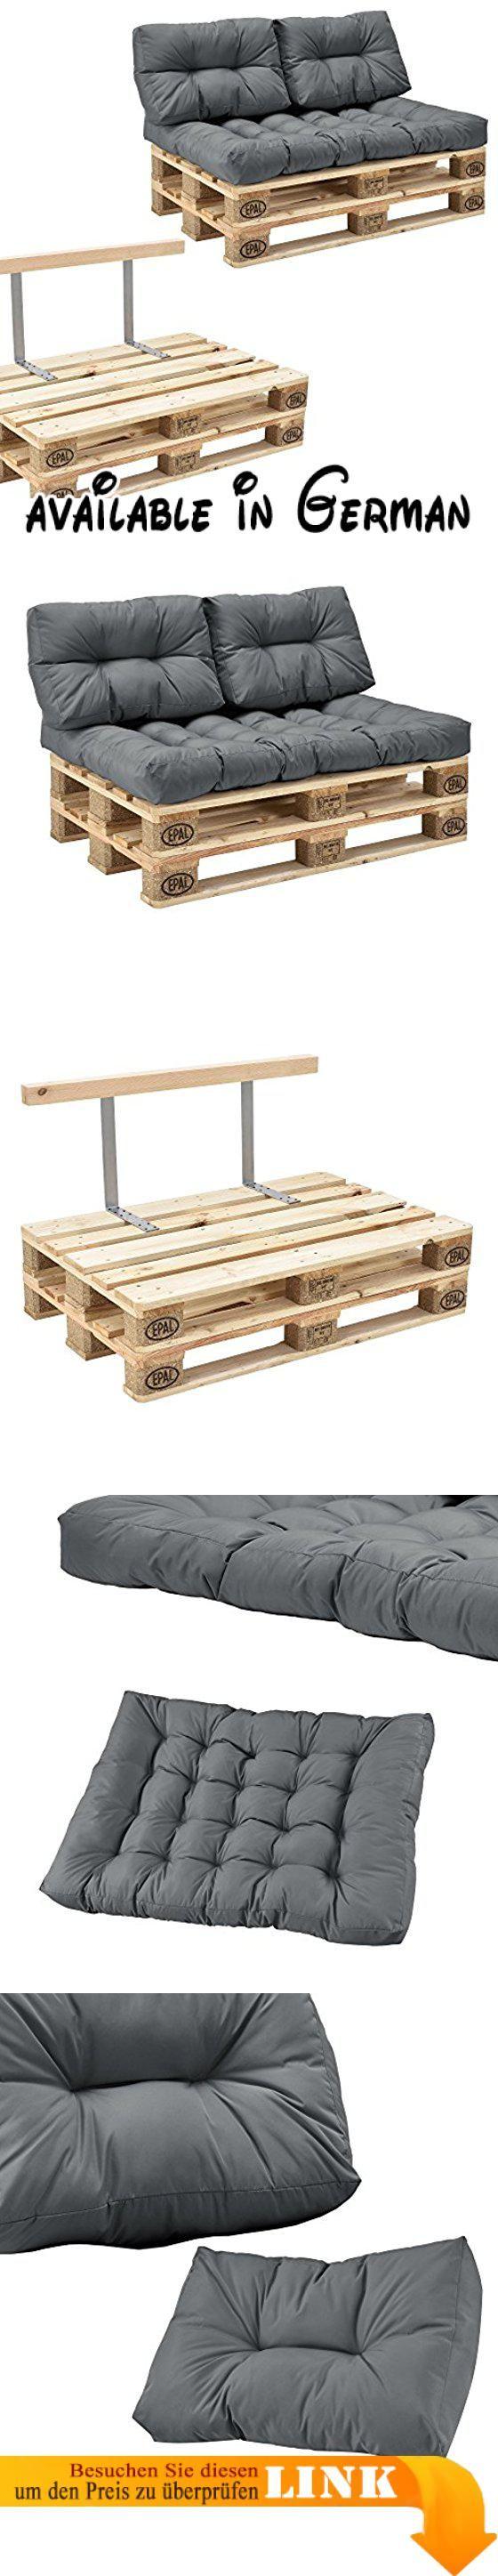 die besten 25 ma e europalette ideen auf pinterest wandregal paletten europalette weinregal. Black Bedroom Furniture Sets. Home Design Ideas